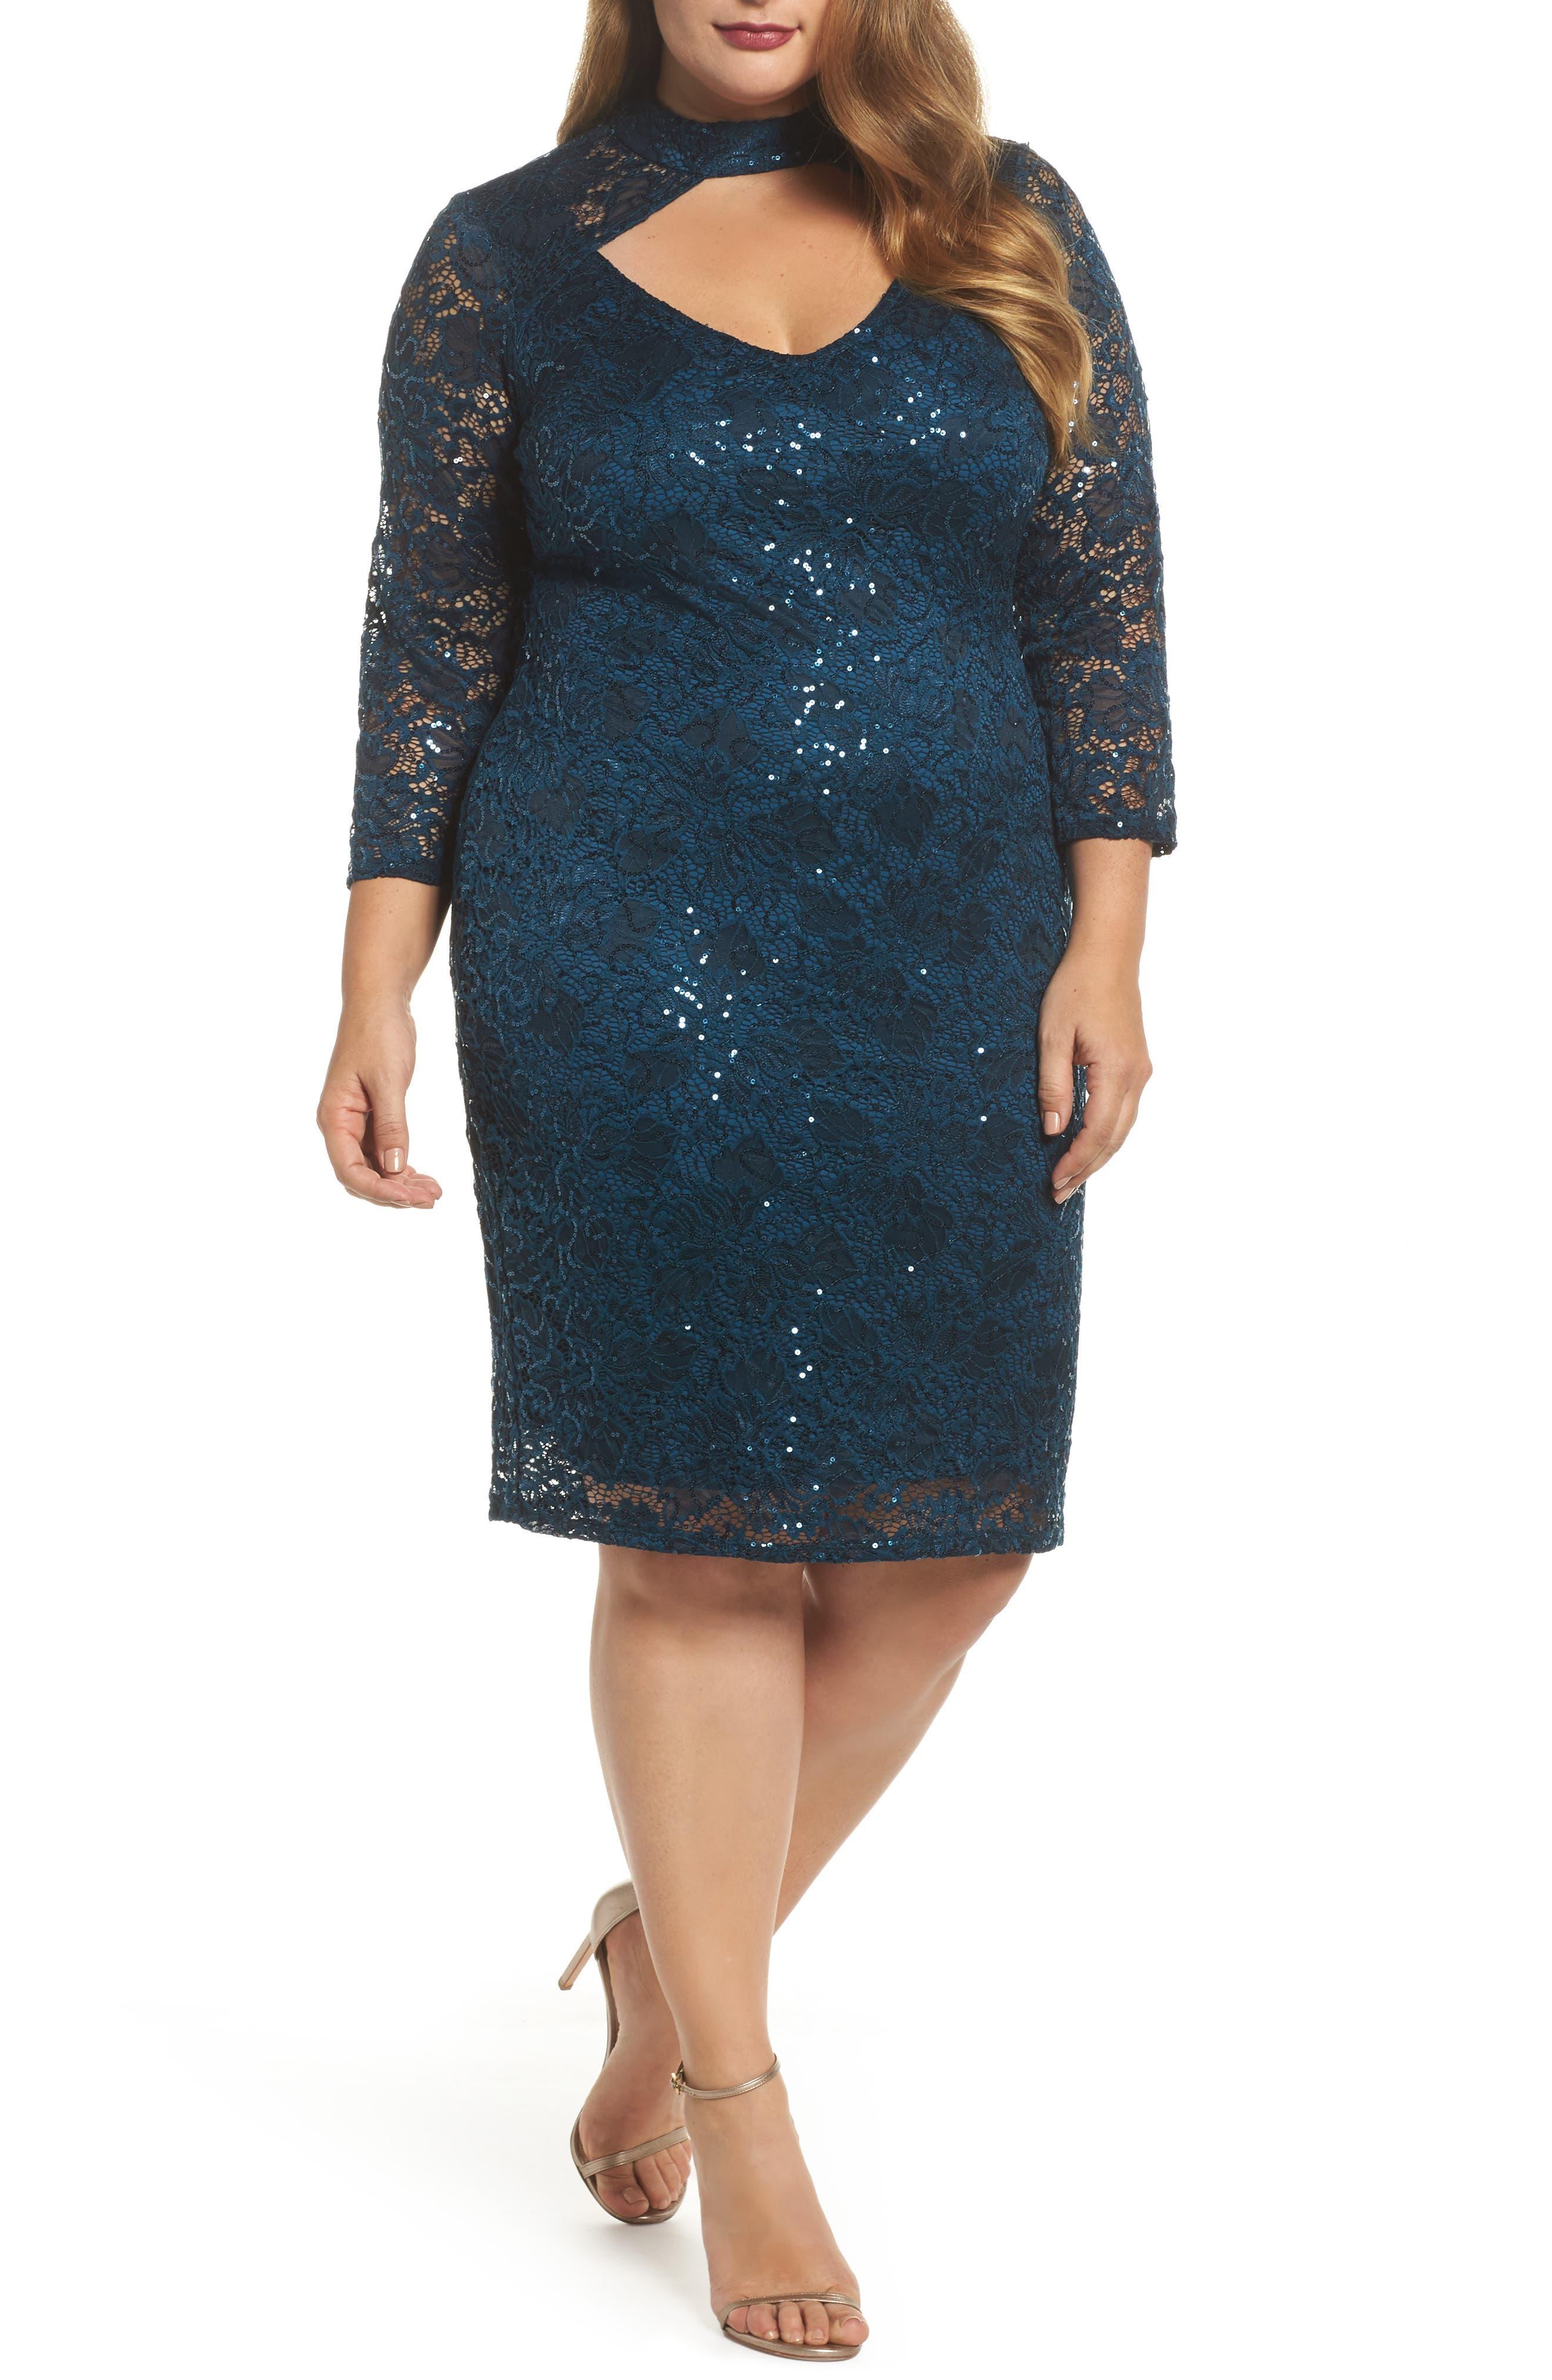 Choker Neck Lace Sheath Dress,                             Main thumbnail 1, color,                             300